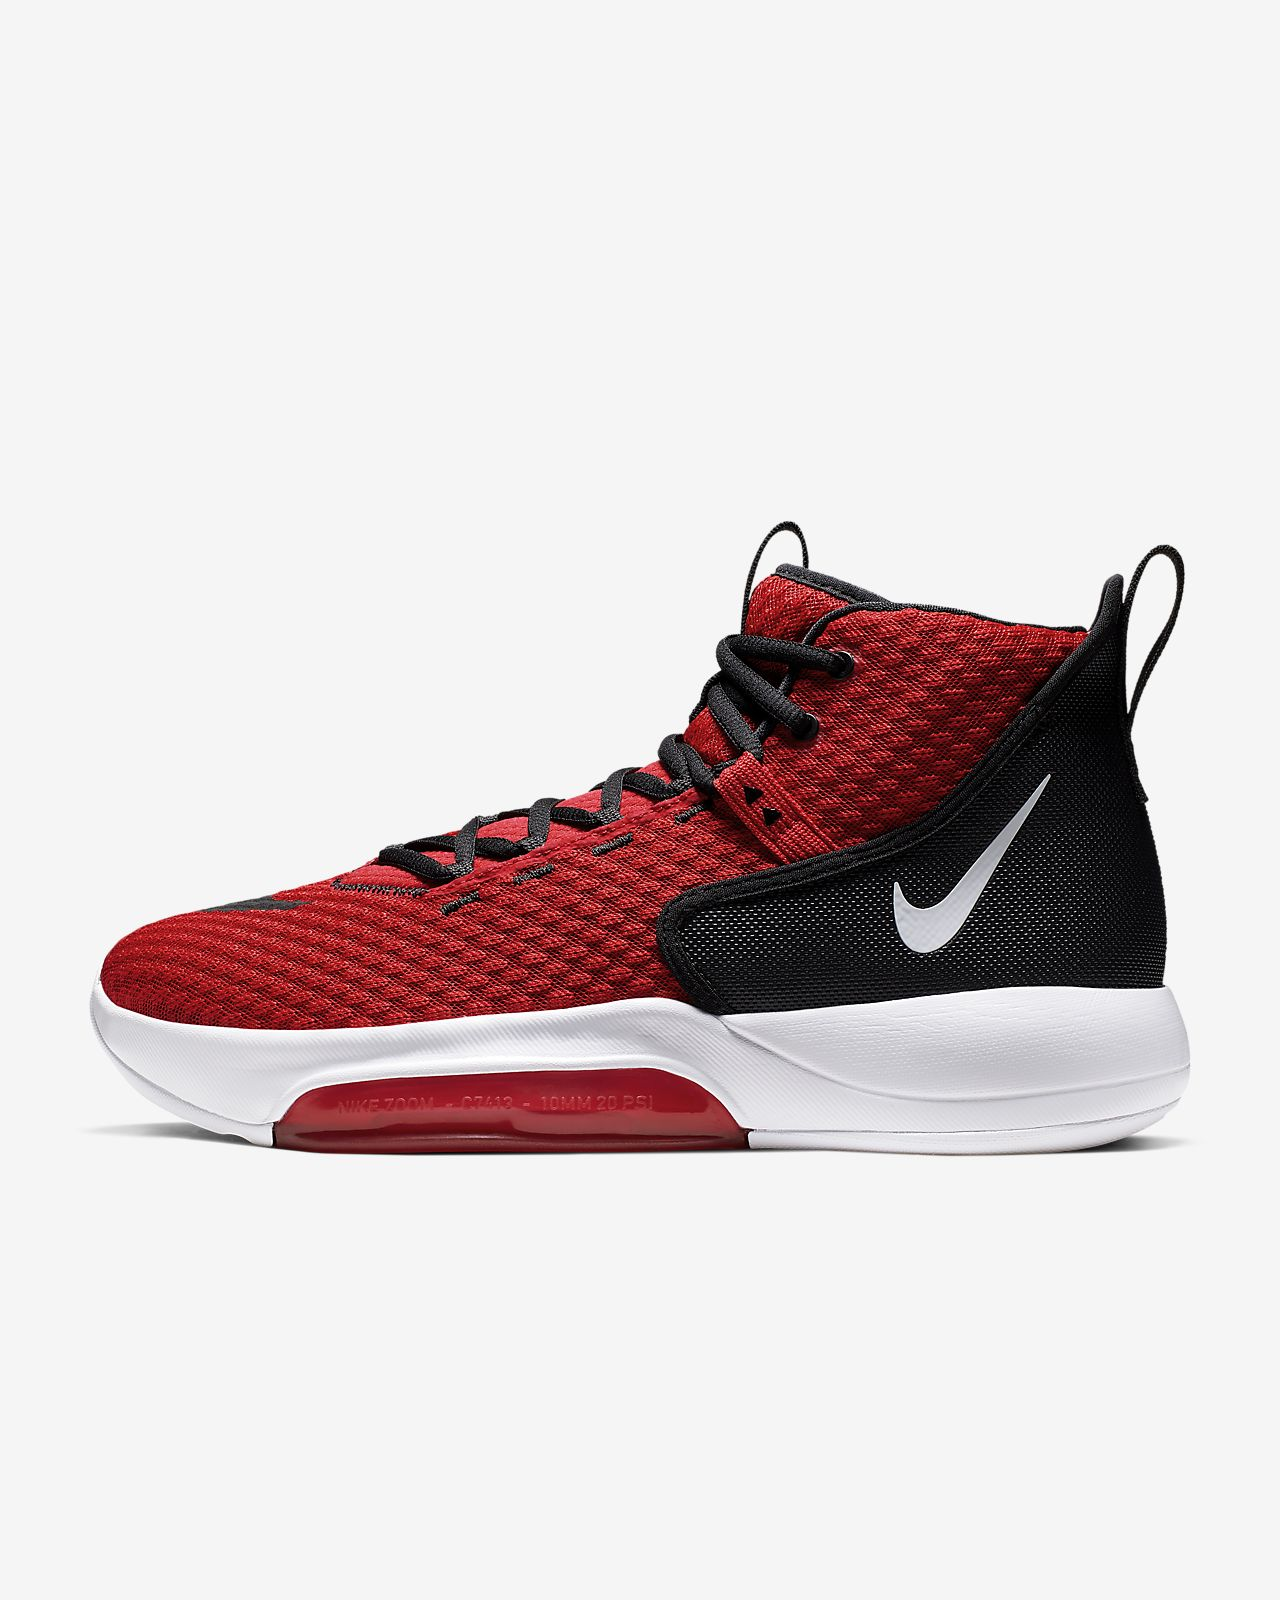 Nike Zoom Rize (Team) Zapatillas de baloncesto